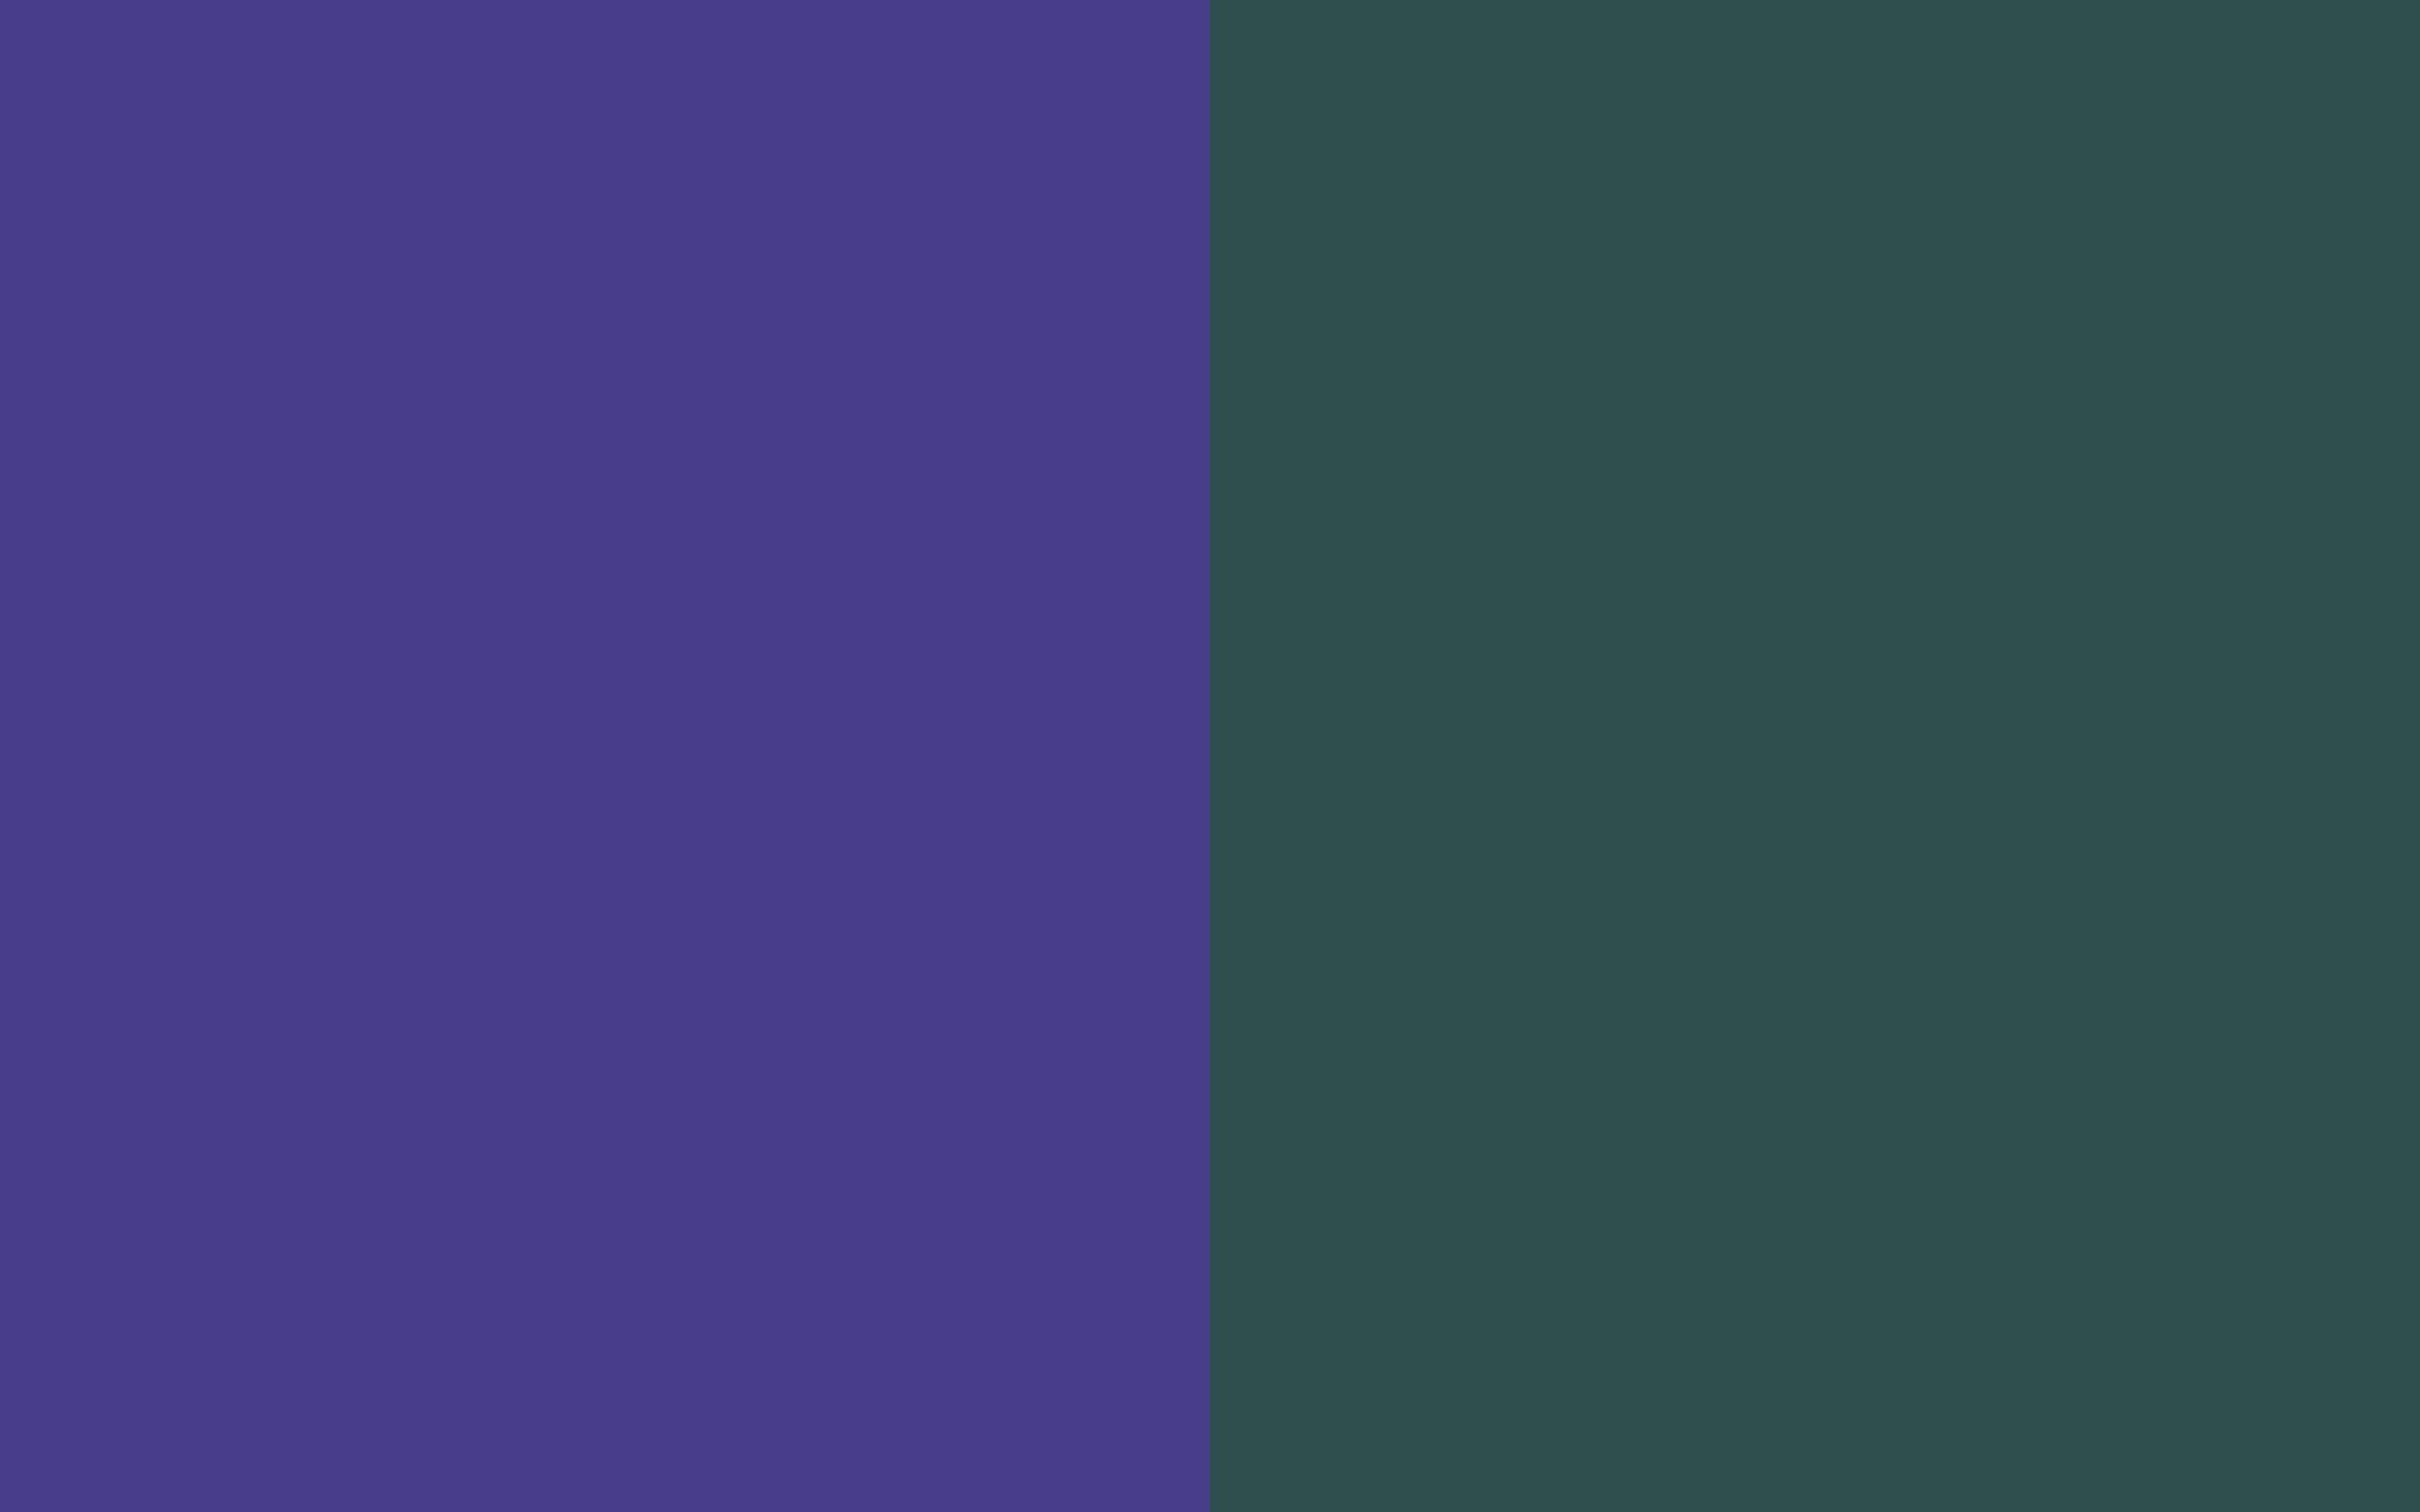 2560x1600 dark slate blue dark slate gray two